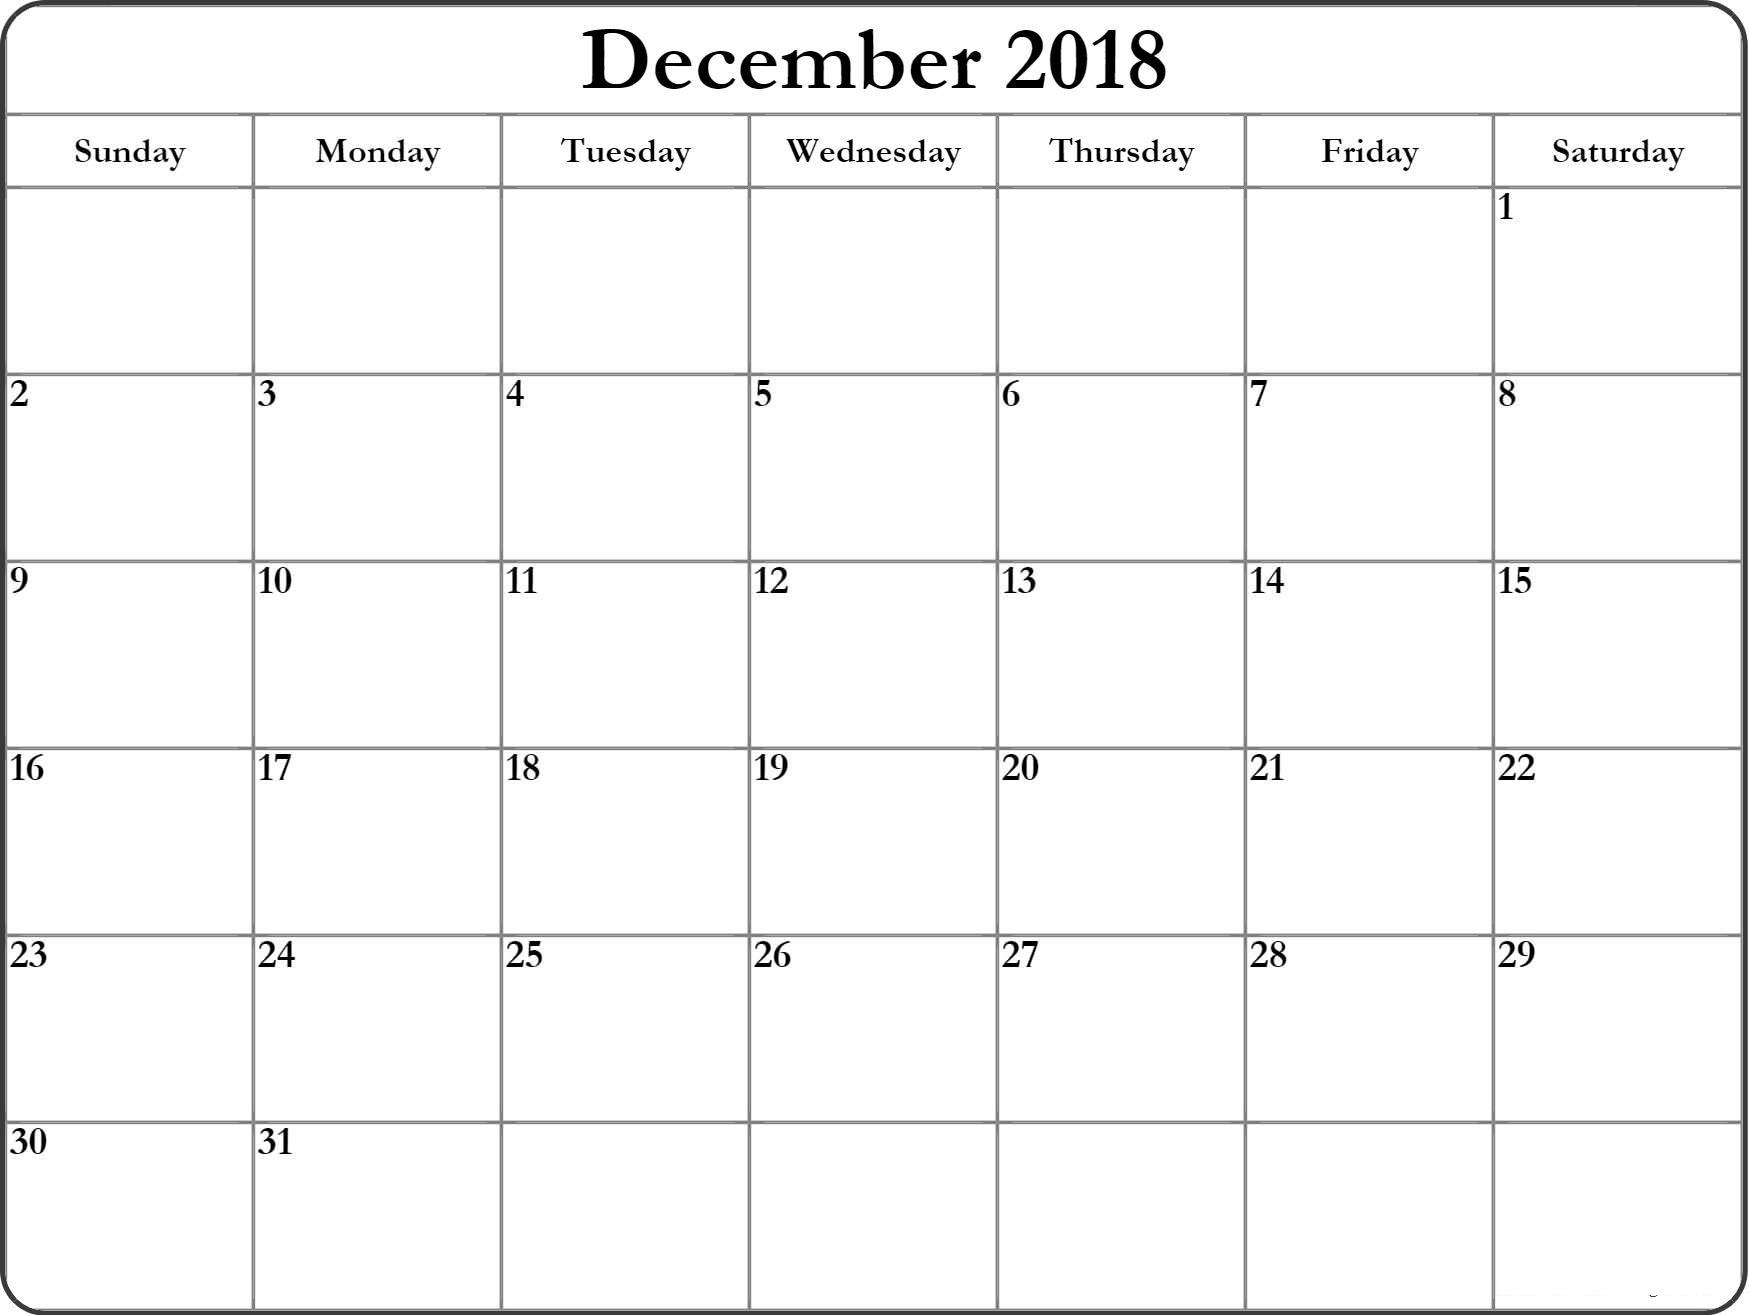 Calendar December 2018 In Word - Printable Calendar 2019| Blank in Blank Printable December Calandar